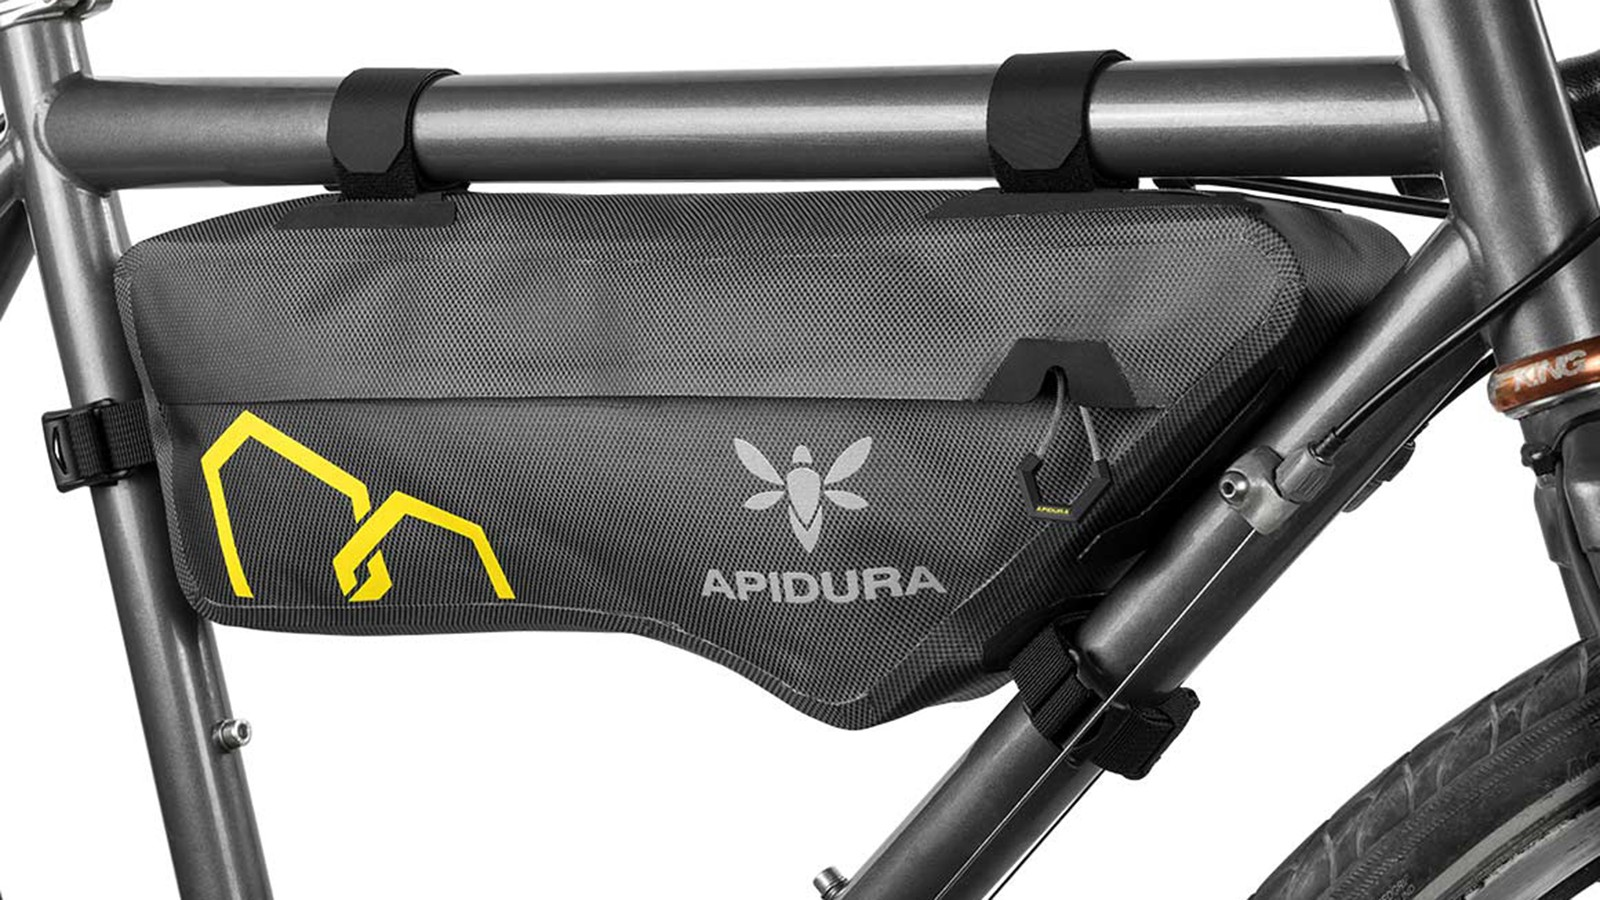 Apidura's Frame Pack